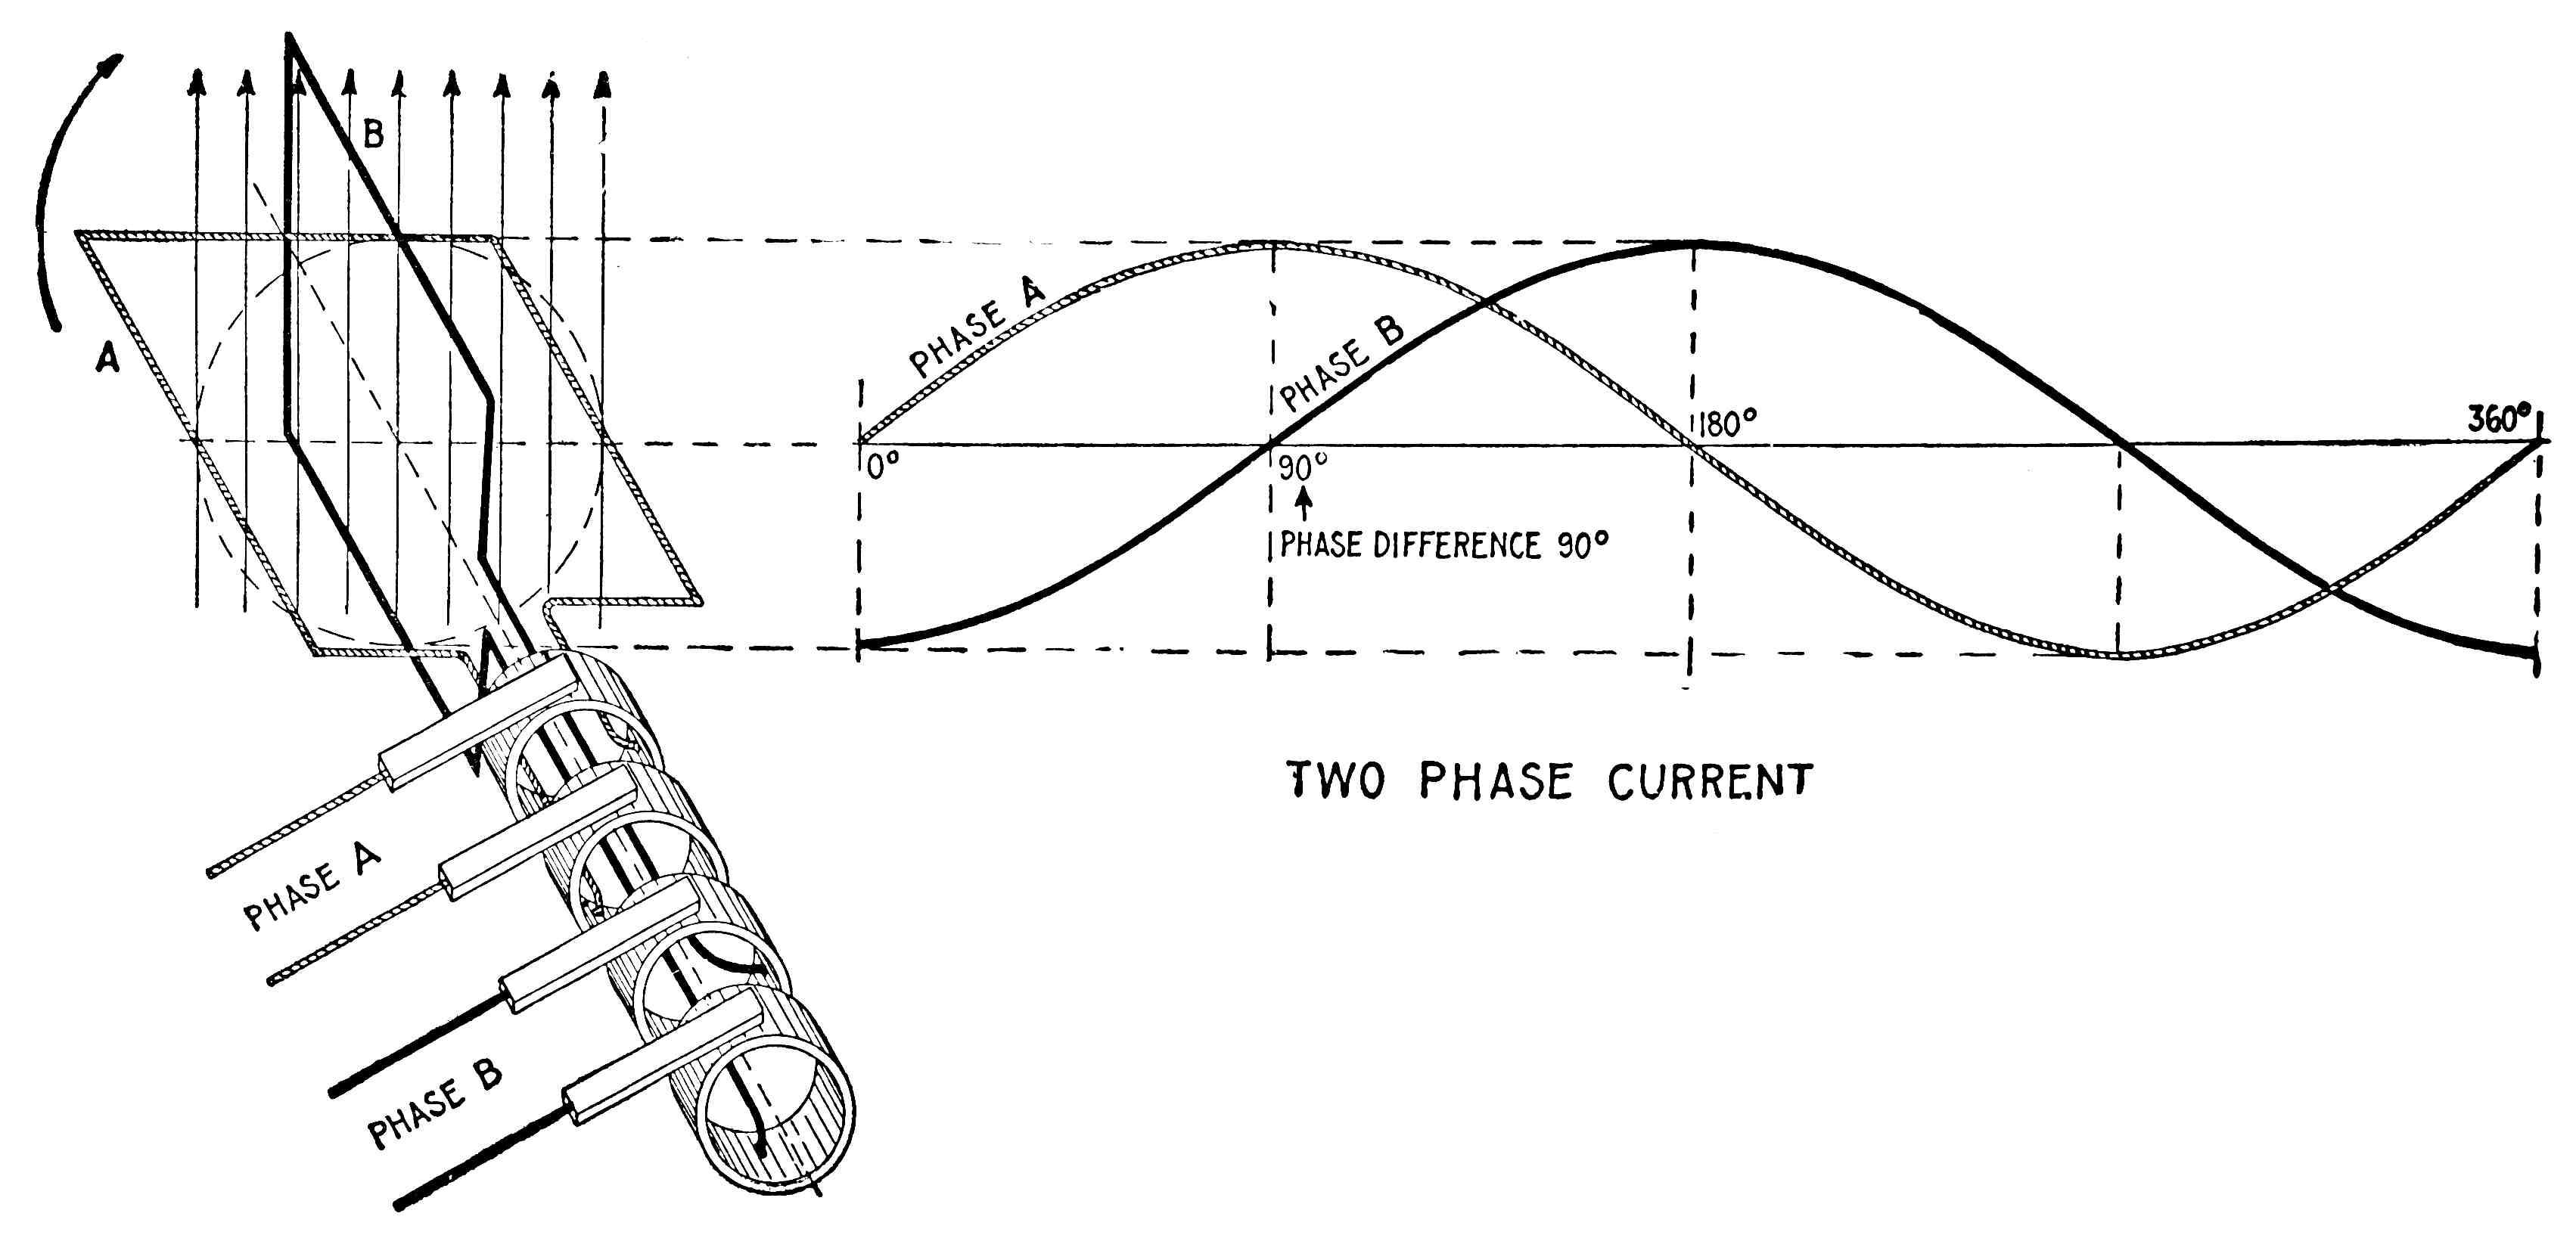 2 phase electrical wiring diagram napco burglar alarm system two electric power wikipedia